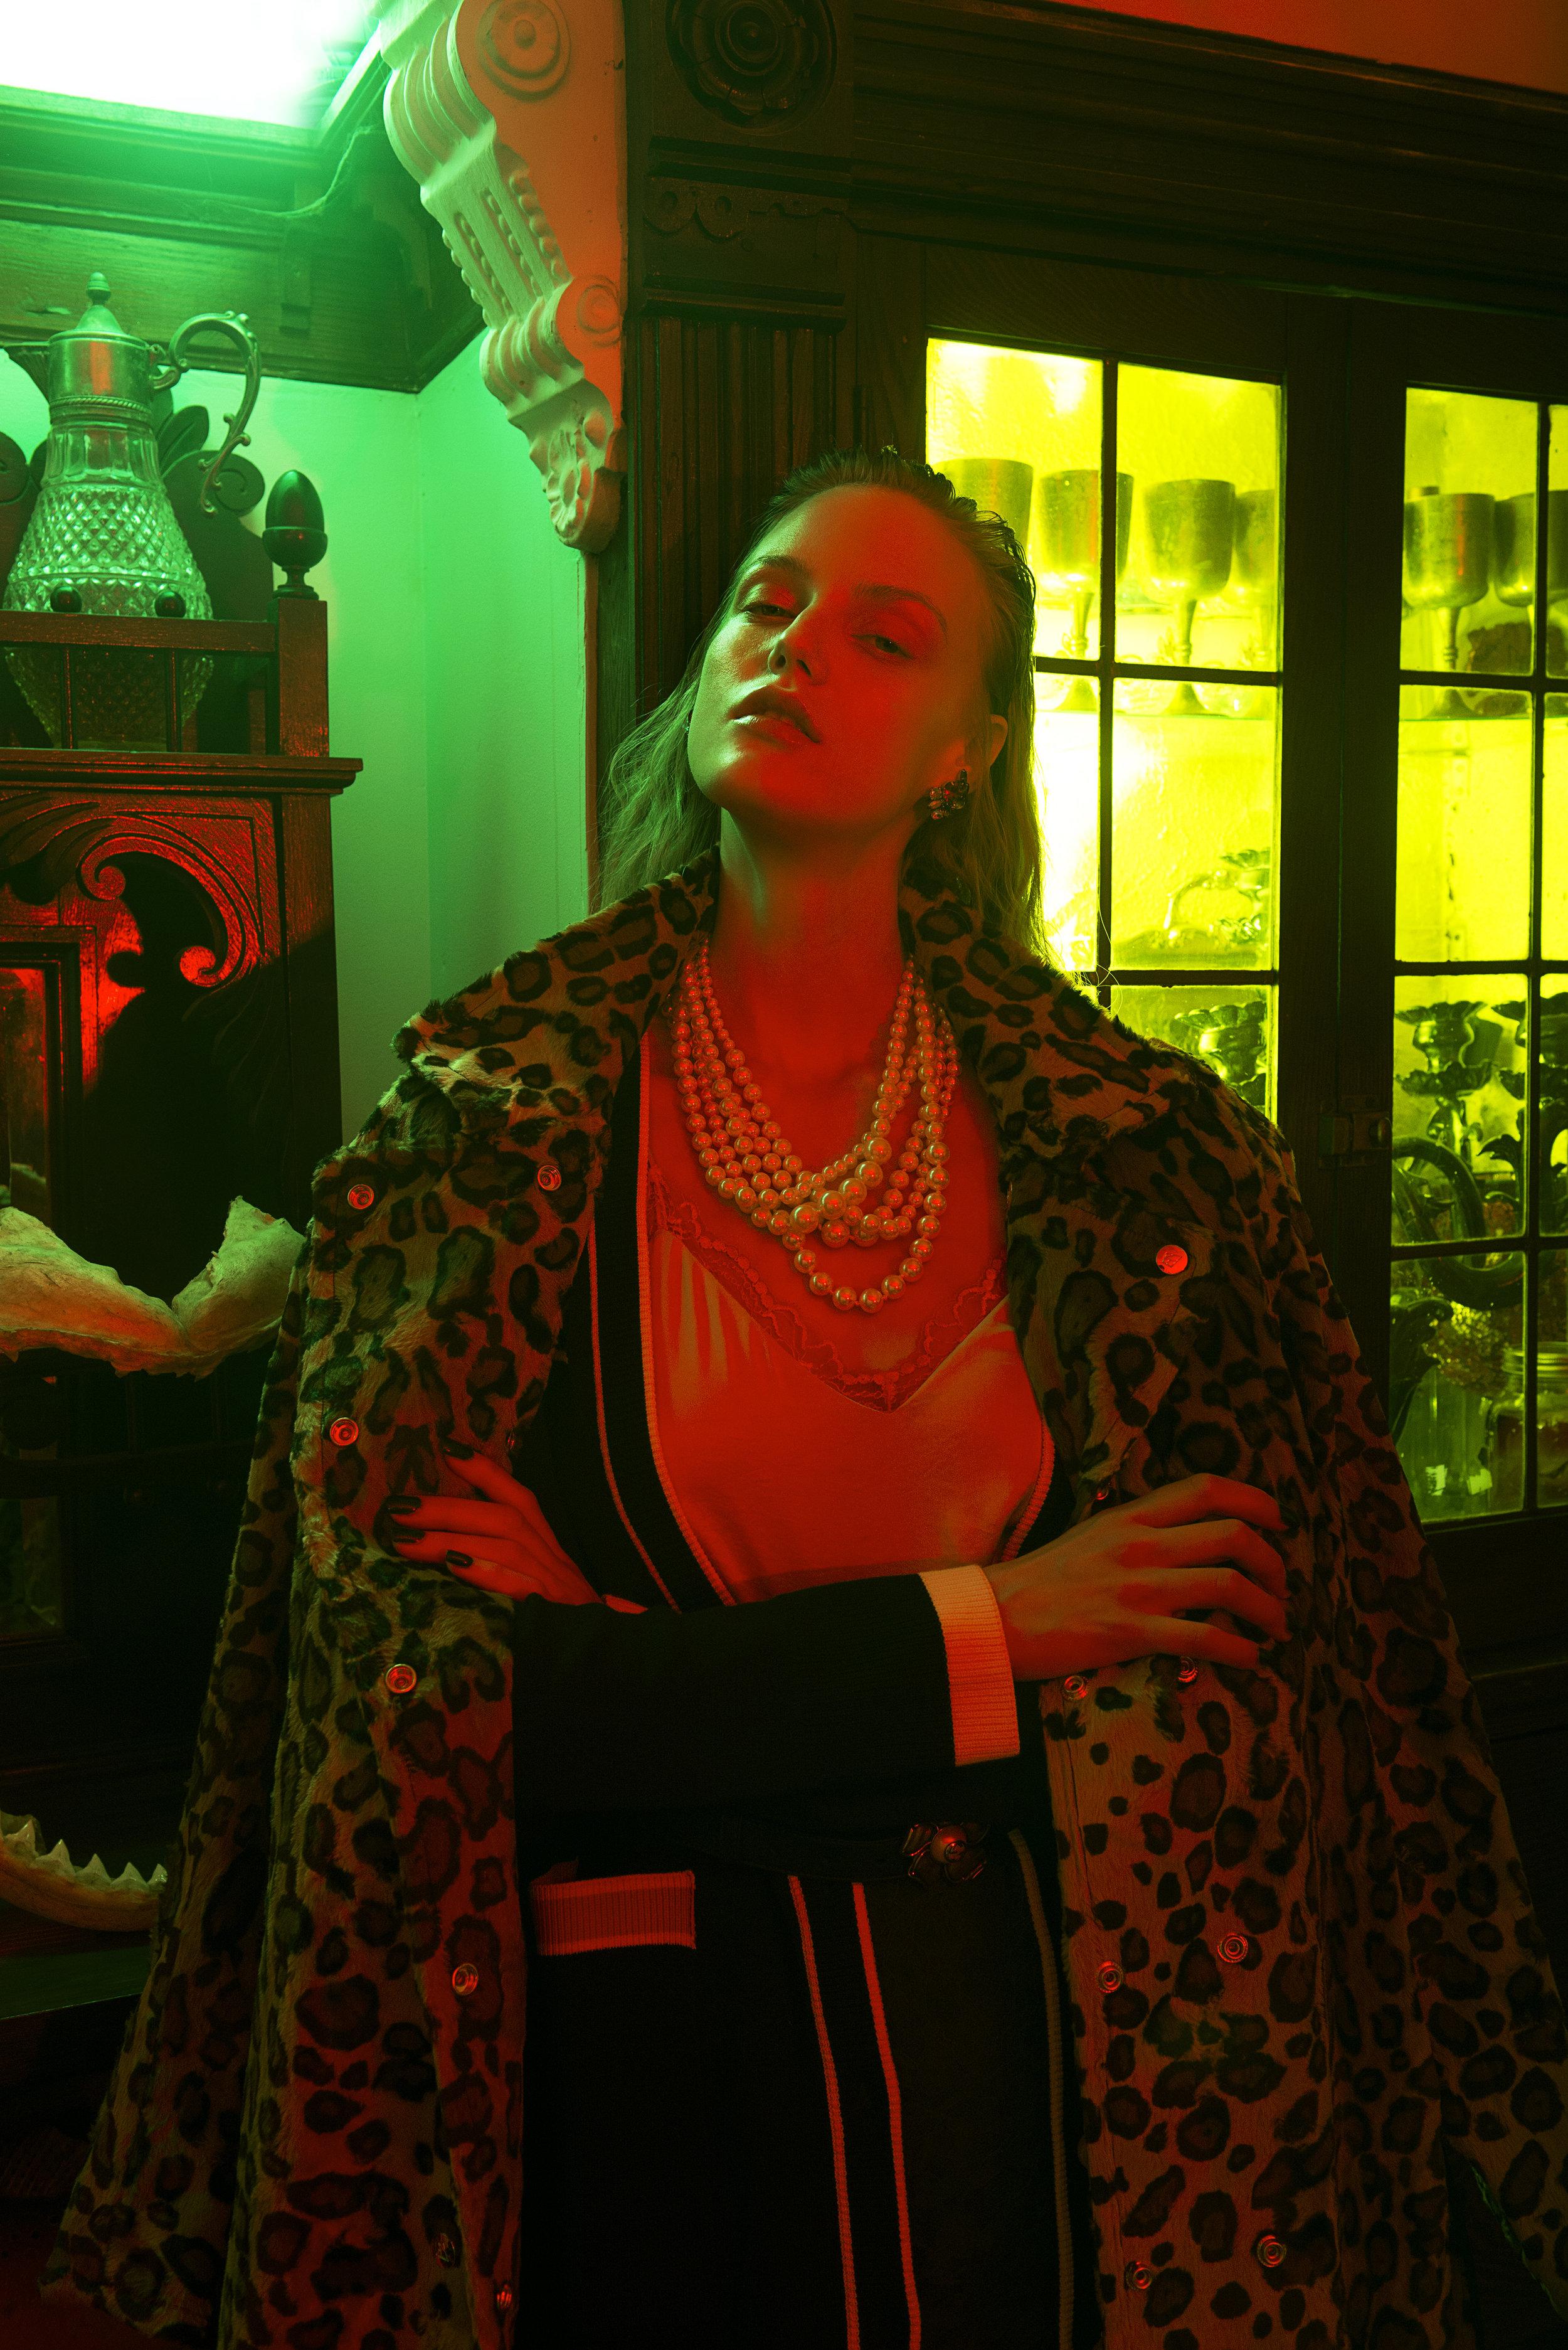 Camisole & Skirt:LITTLE MOON / Belt: GUCCI / Necklace: J CREW / Coat: THERMAKOTA / Cardigan:ZARA